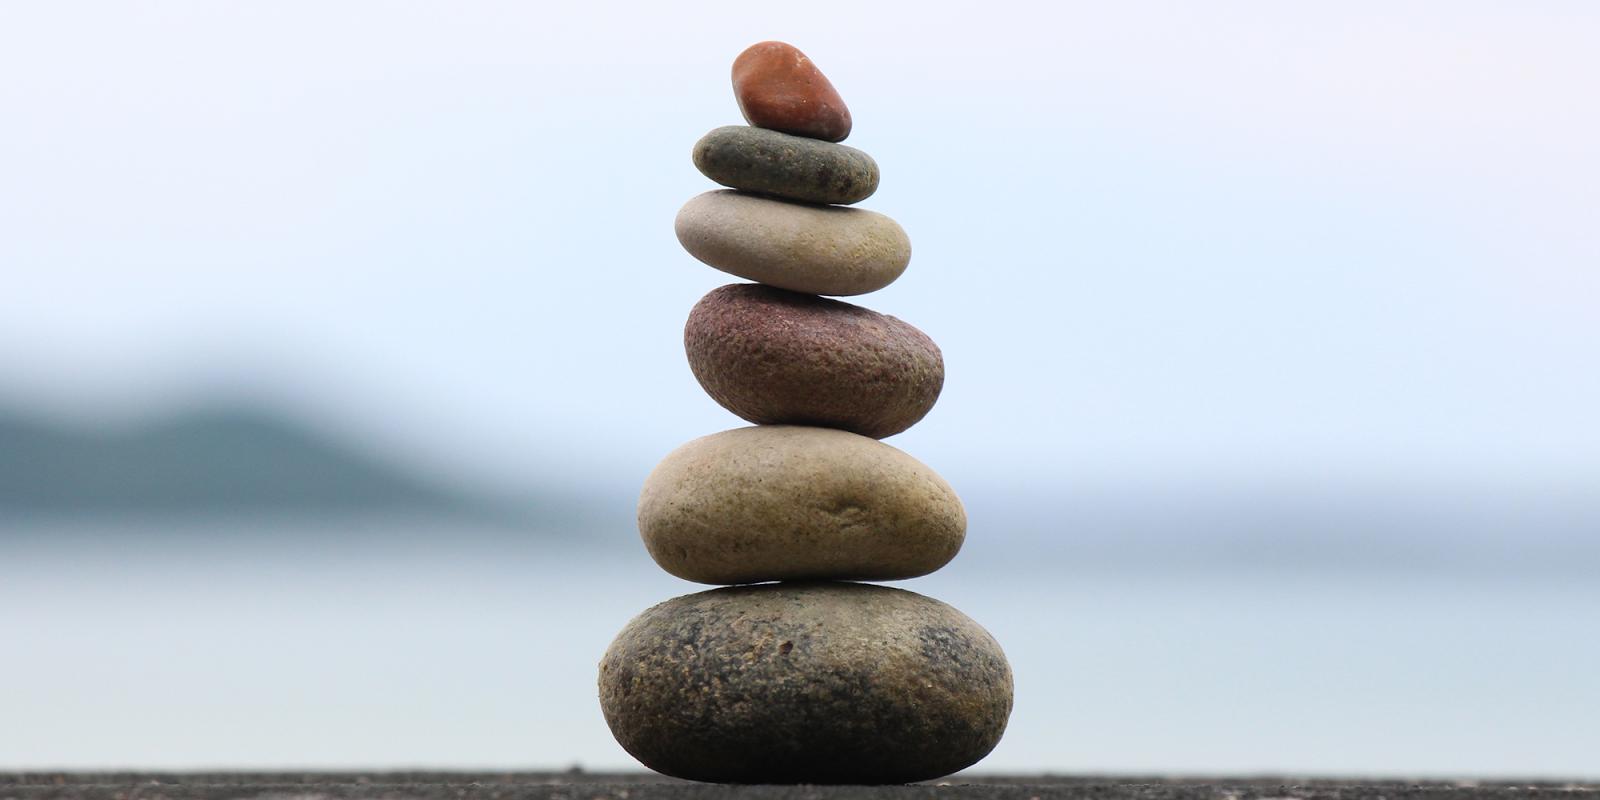 Rocks balanced vertically